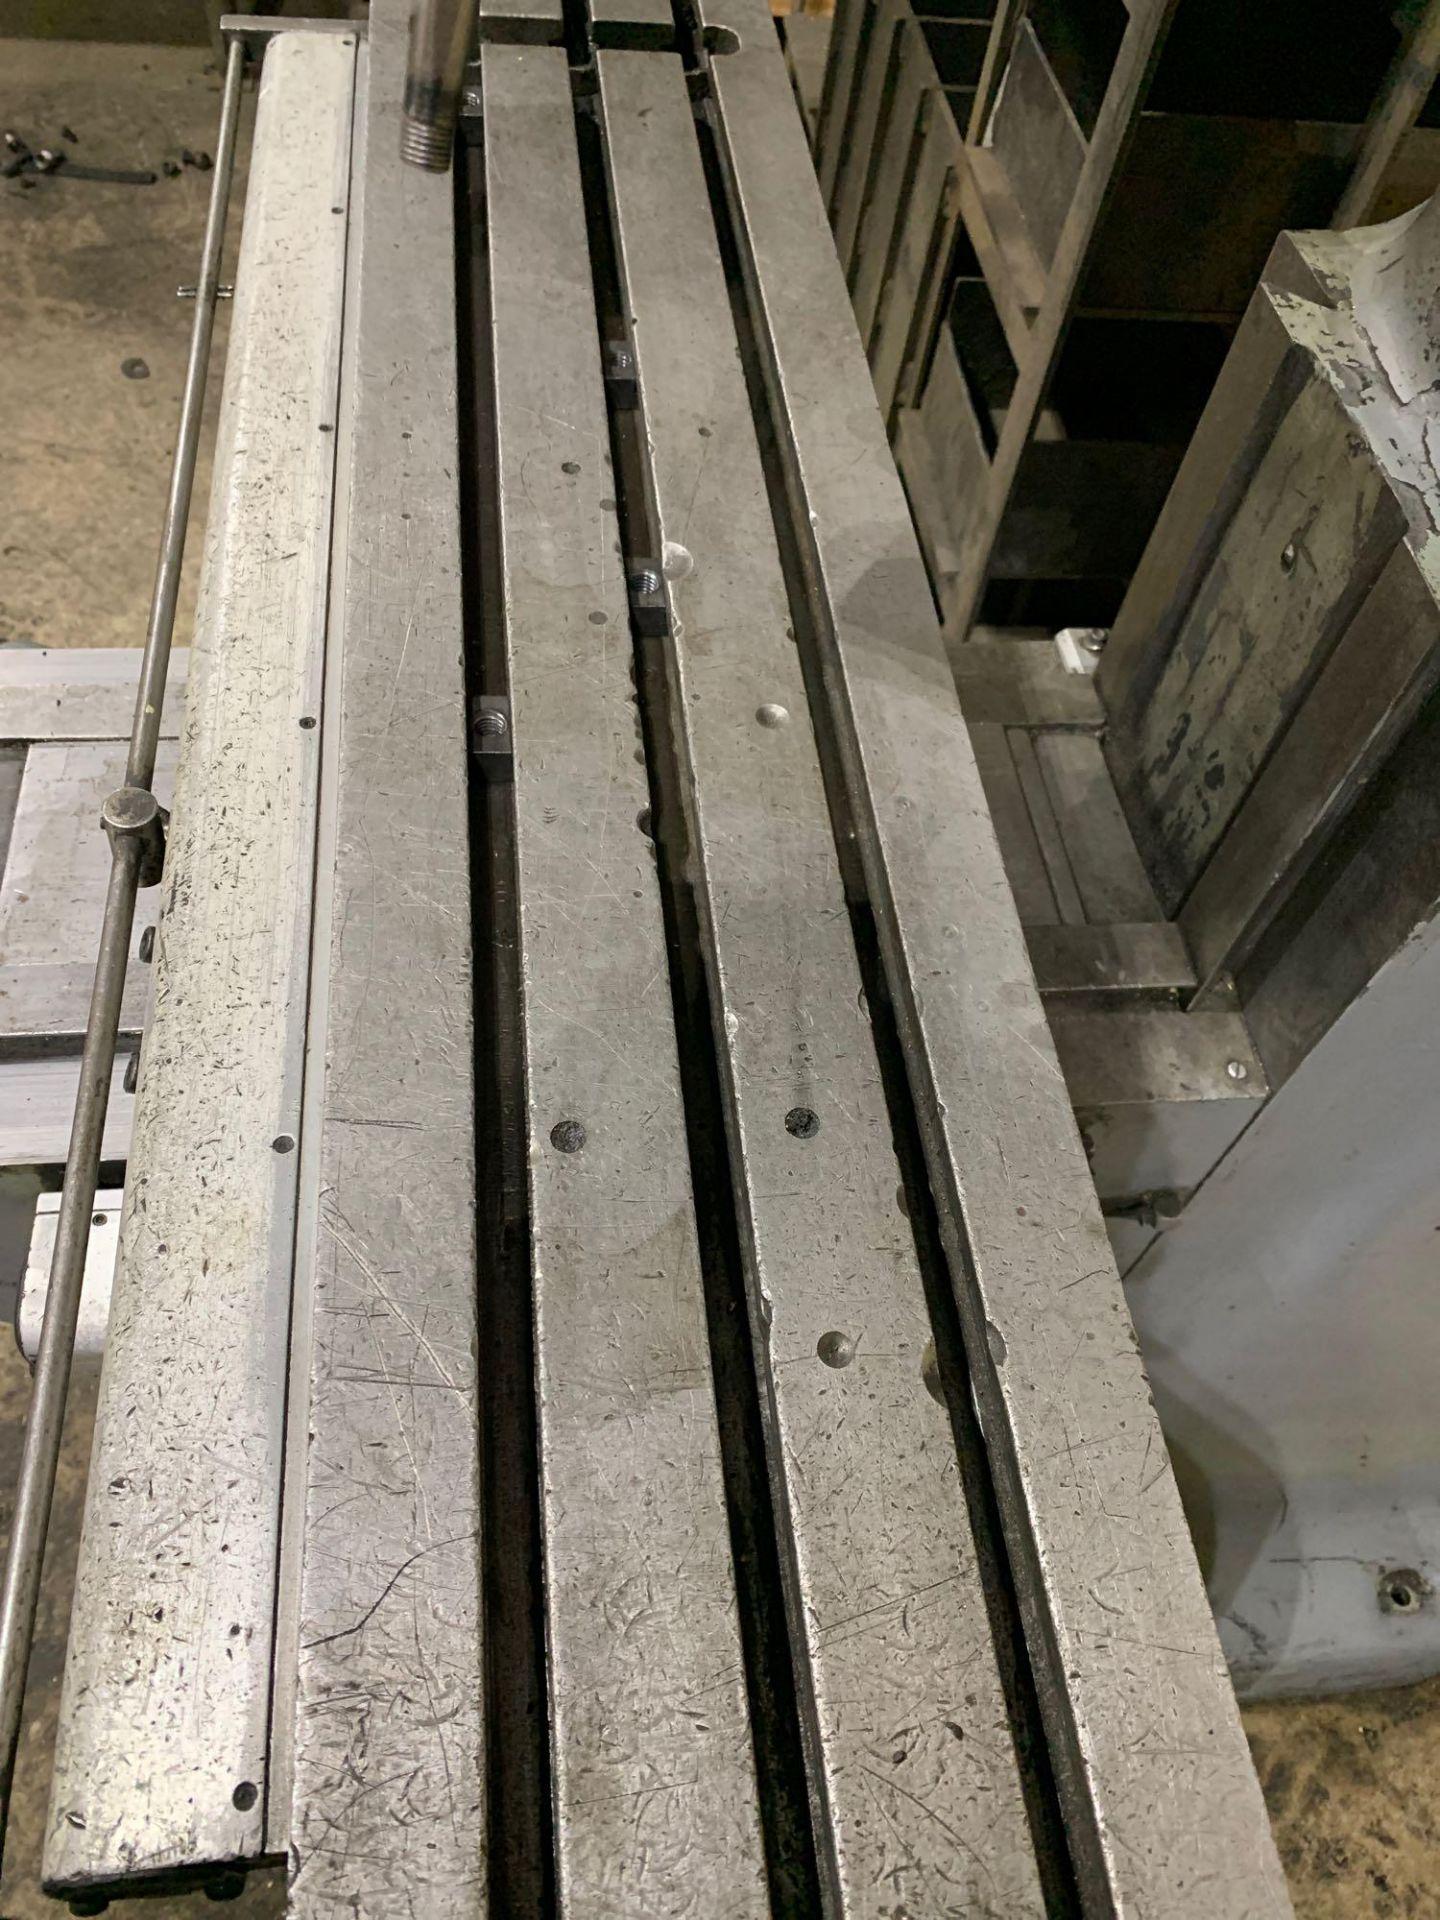 "Bridgeport 2J Vertical Milling Machine Variable Speed Head S/N 132833 CAPACITIES Table size: 9"" X 42 - Image 8 of 12"